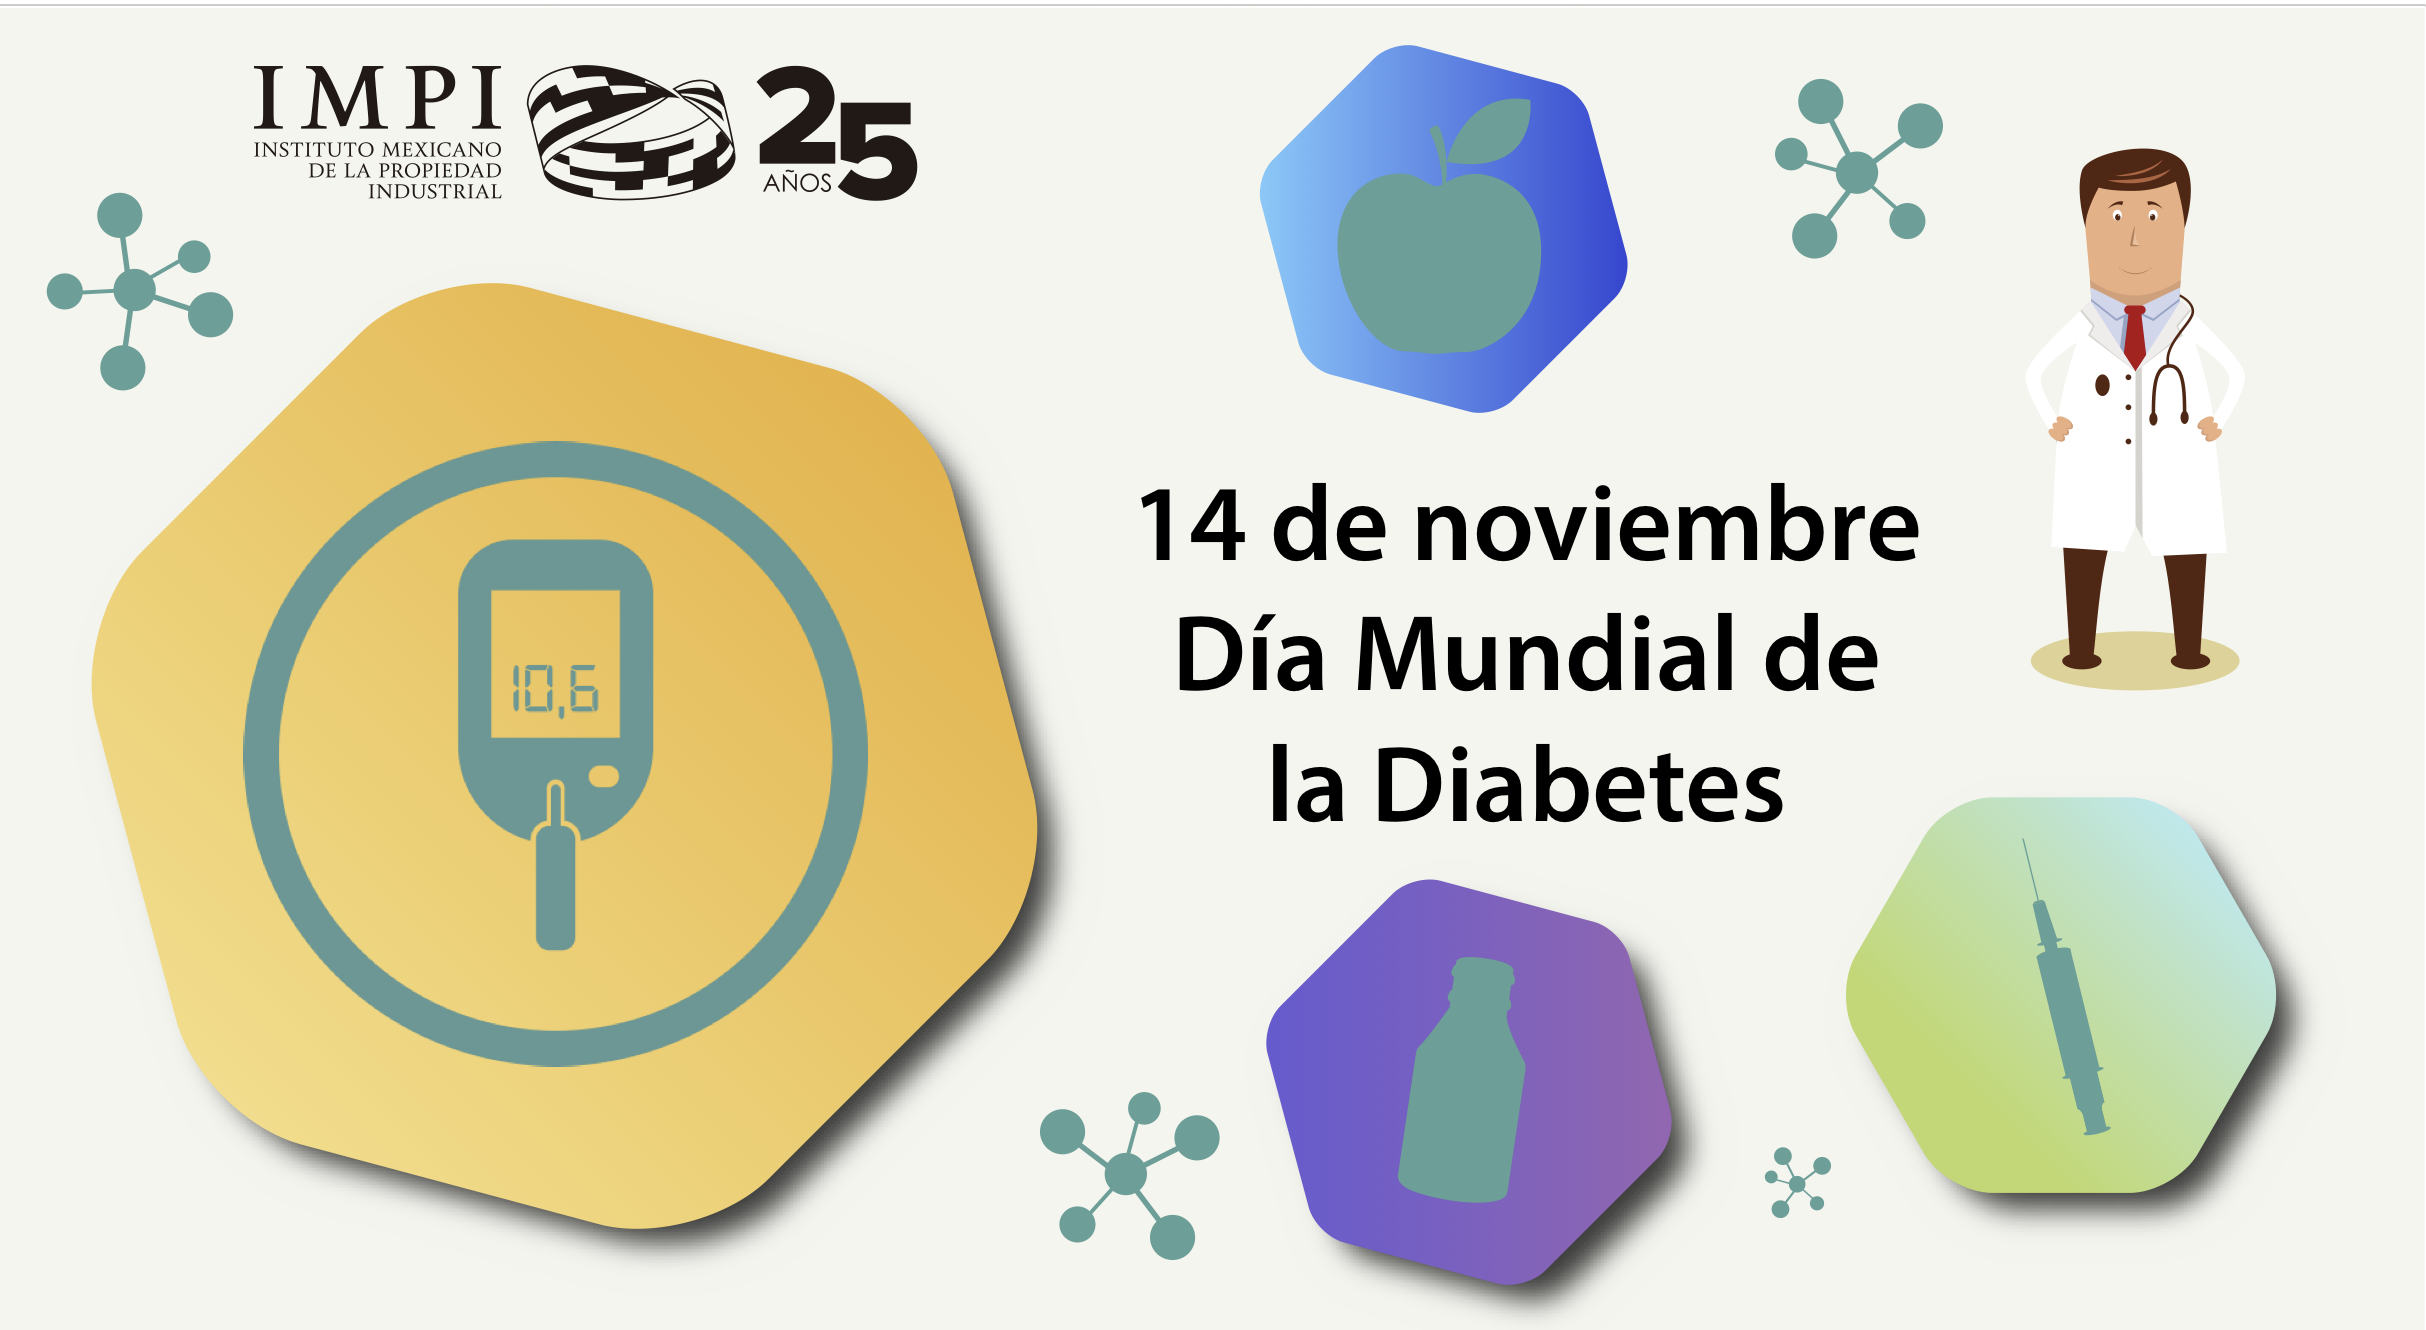 dia mundial de la diabetes oms internacional